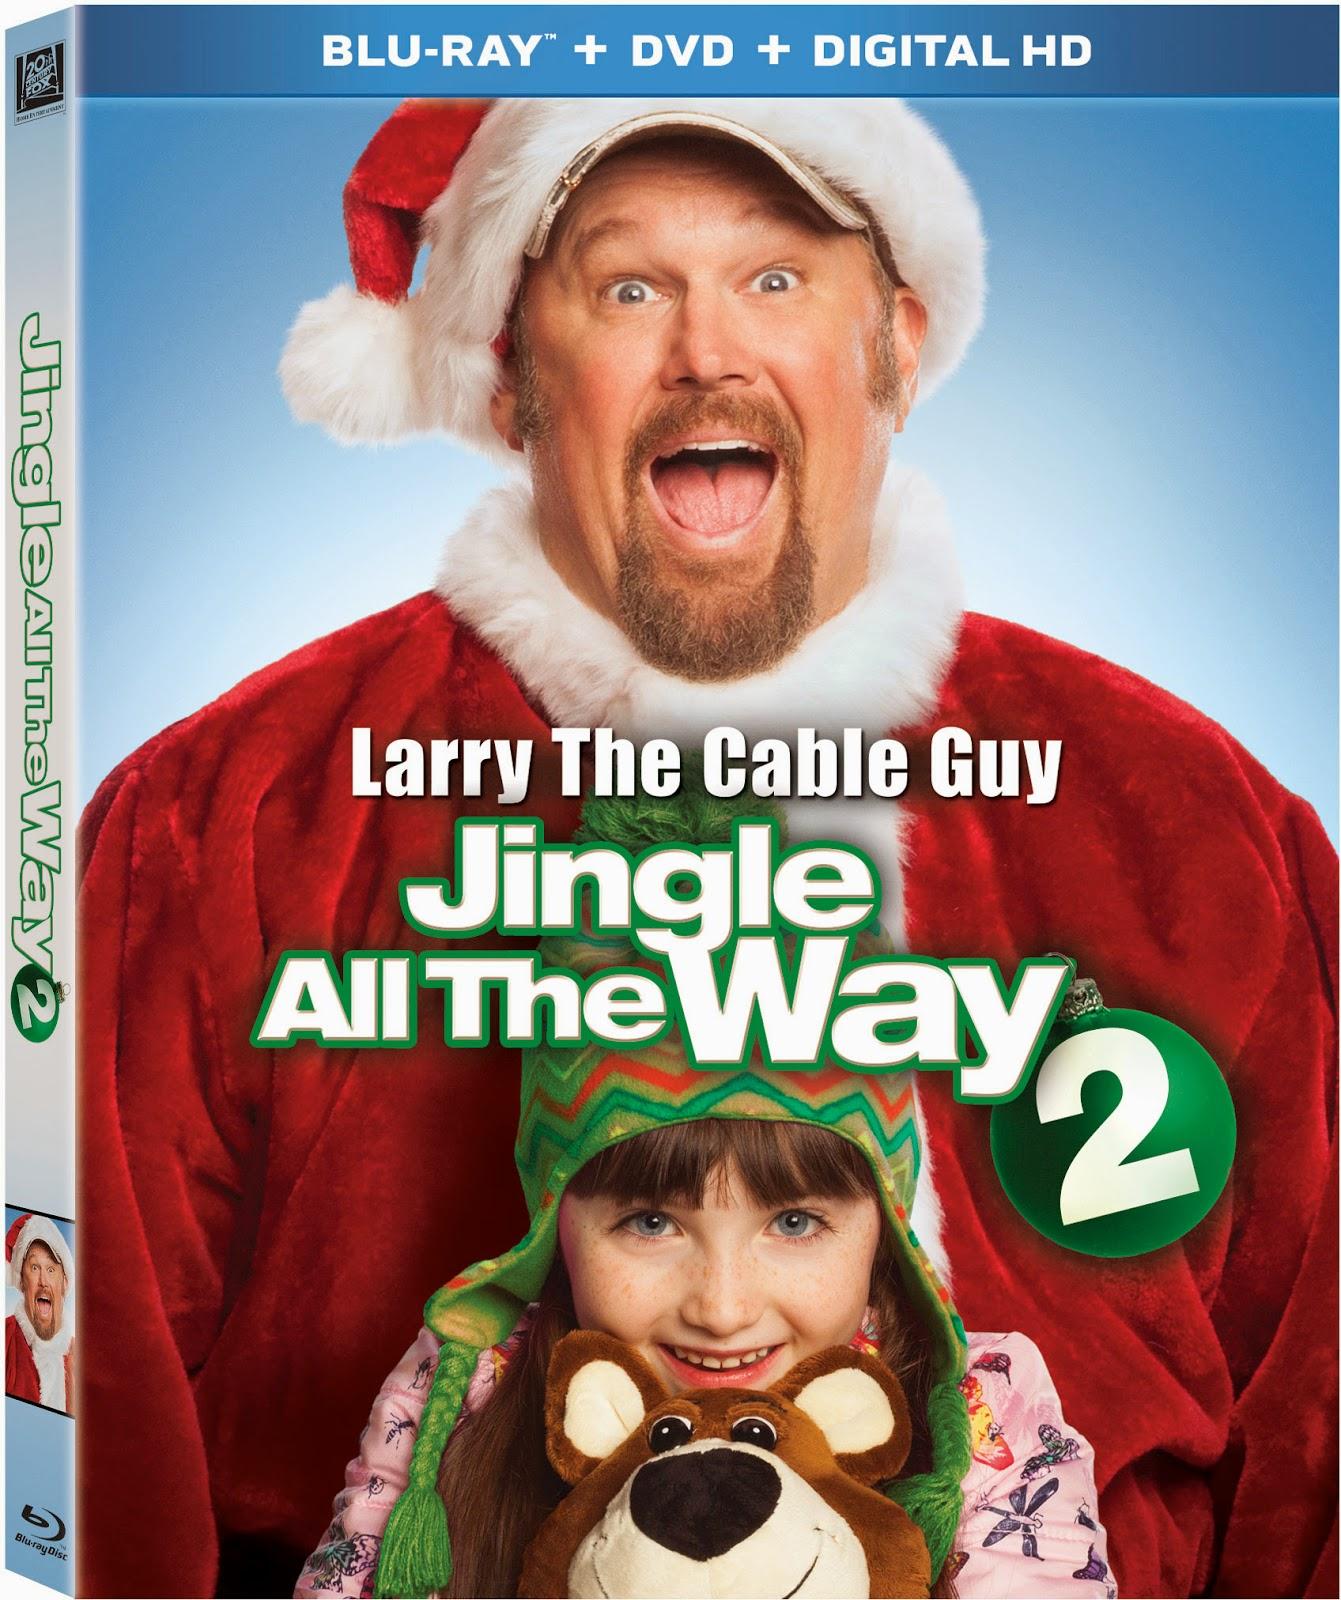 Heck Of A Bunch: Jingle All the Way 2 - #JingleInsiders Giveaway